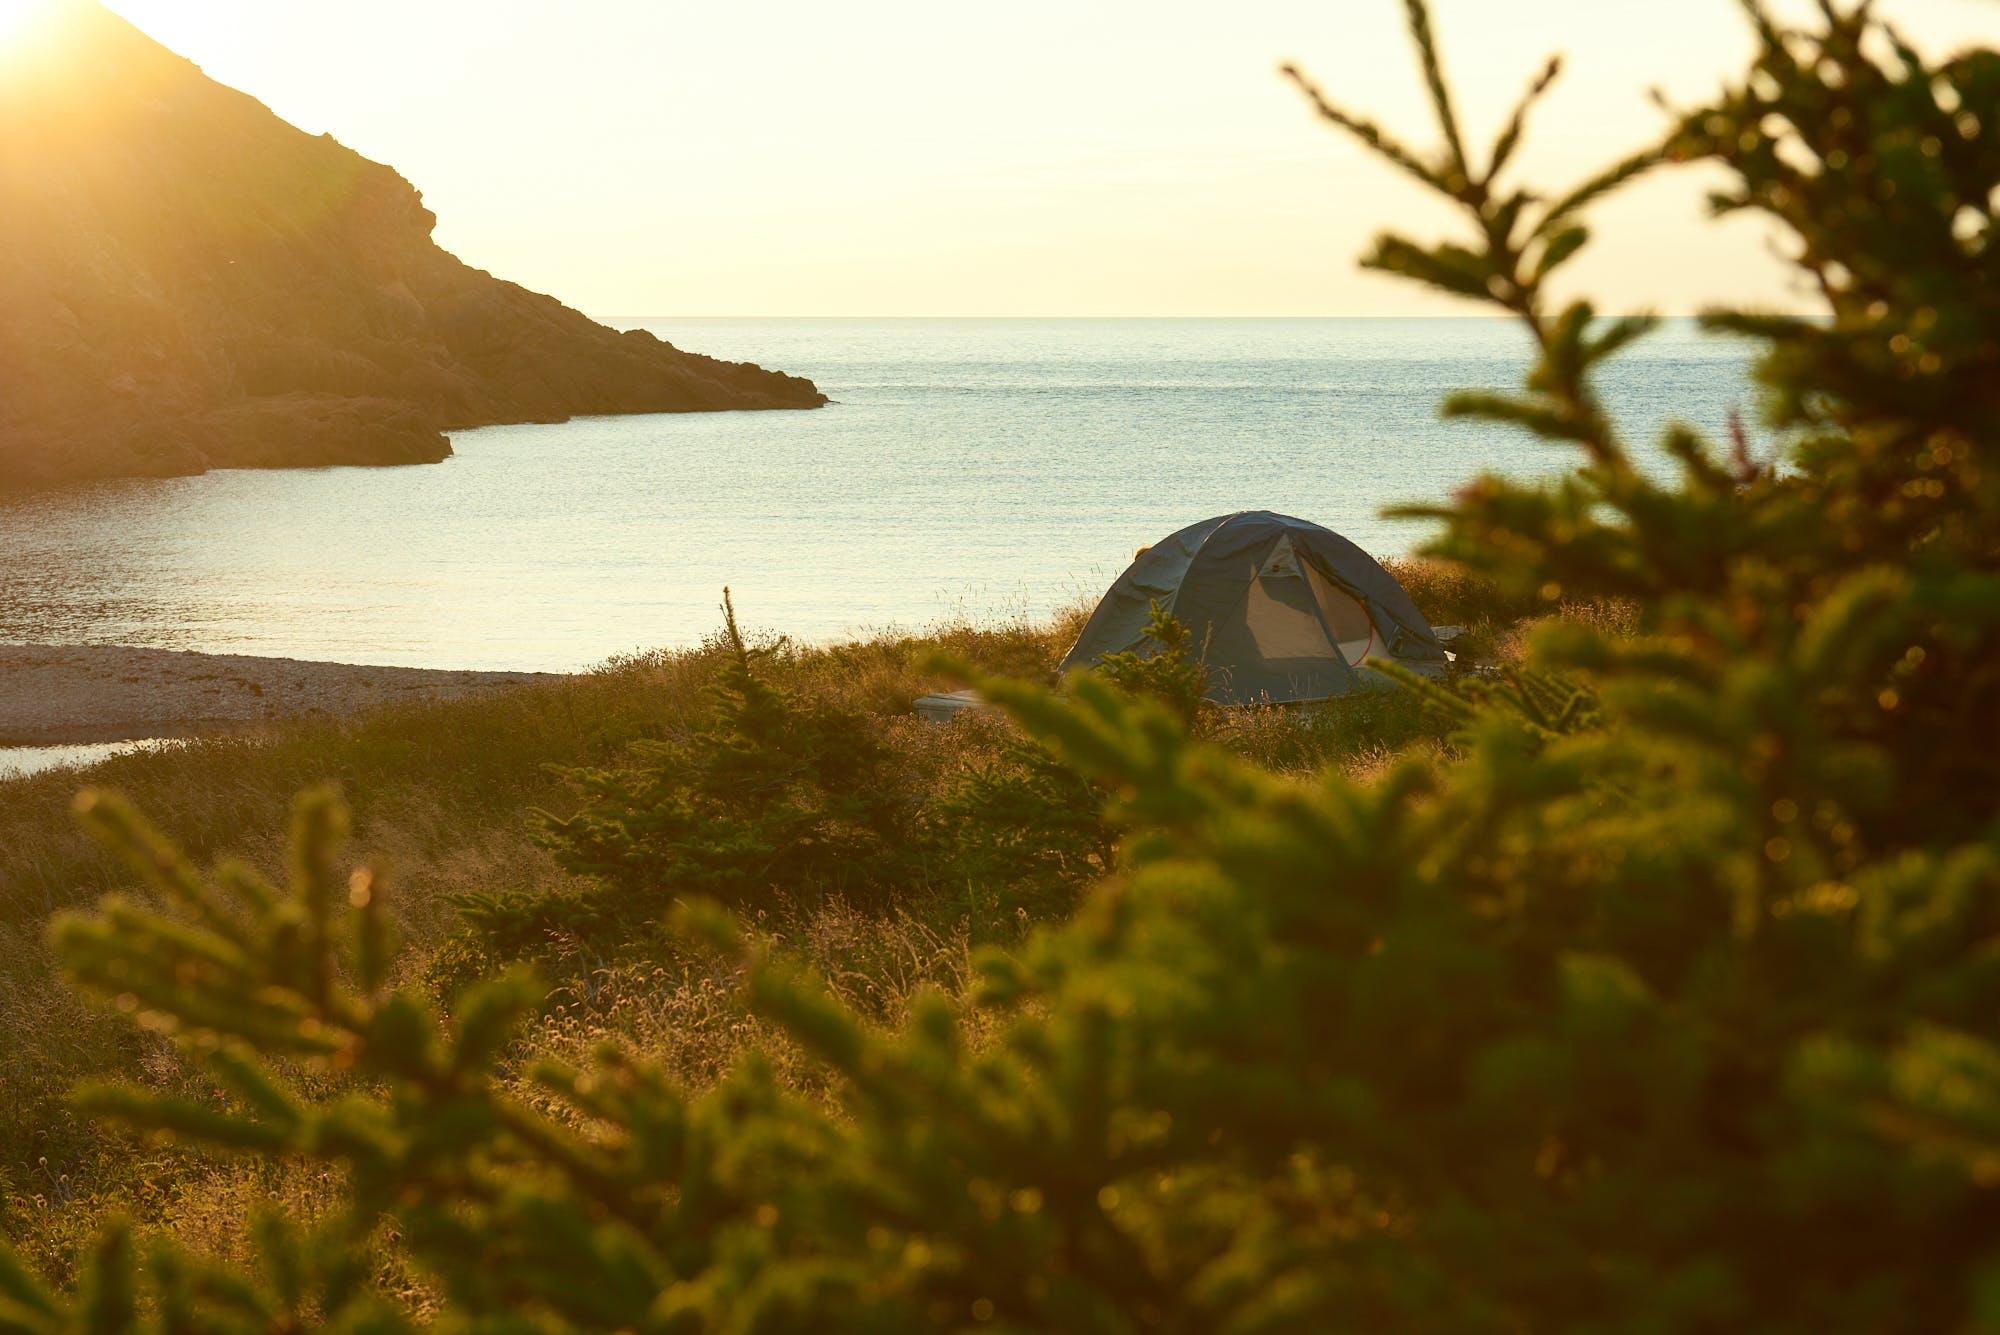 Fishing Cove at sunset. - Jason Nugent photo